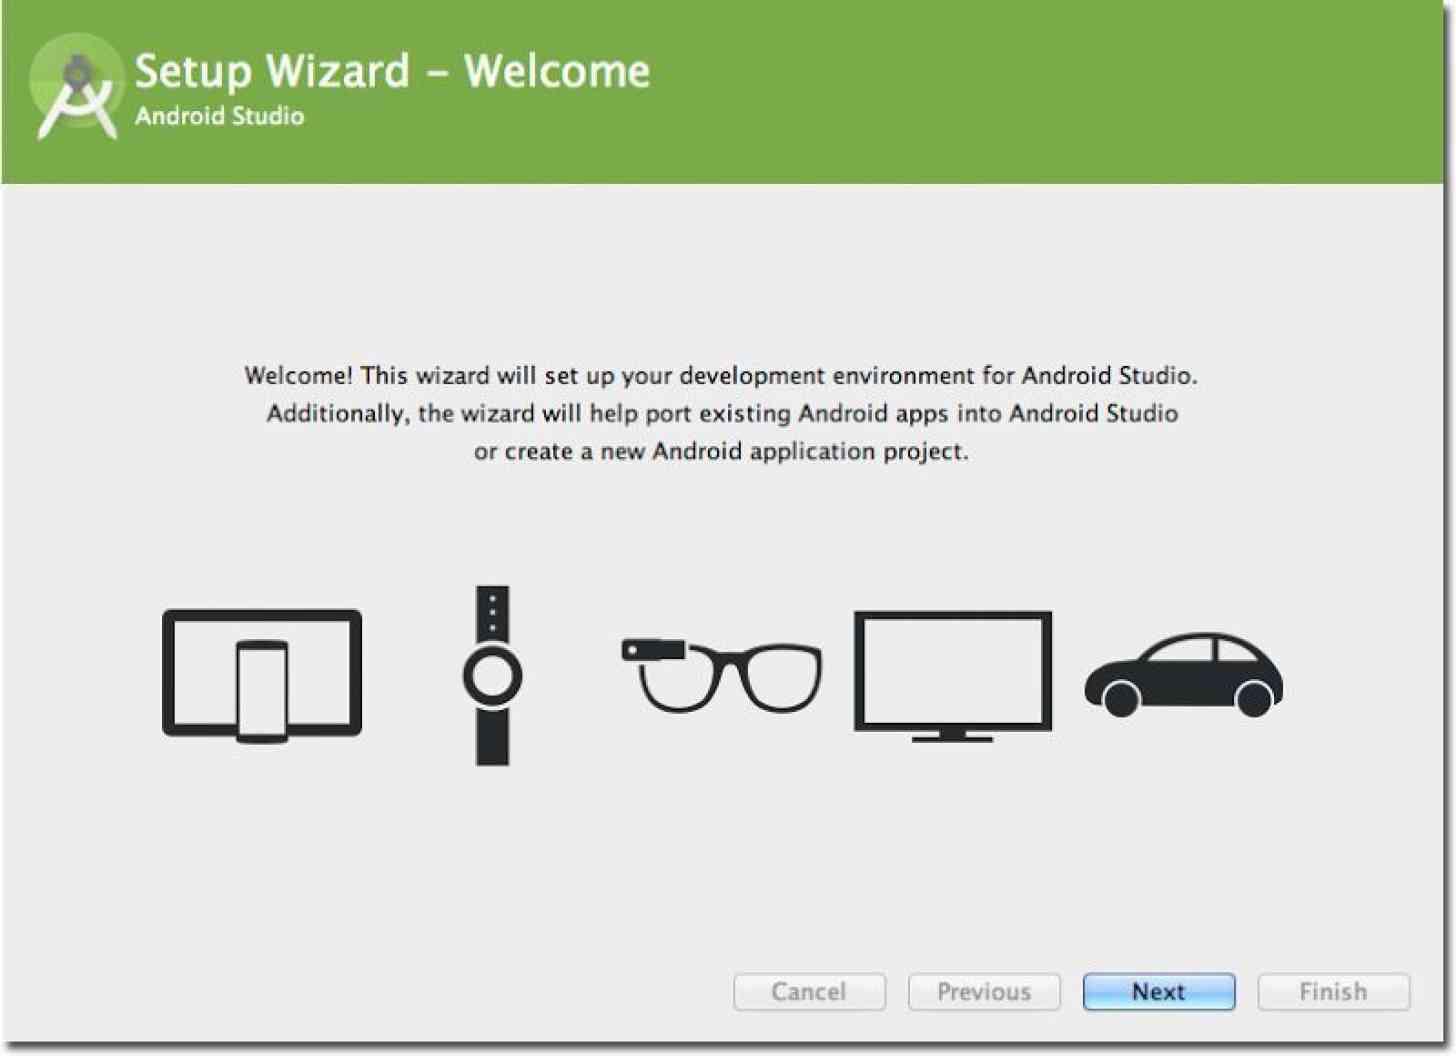 Android Studio 1.0 setup wizard